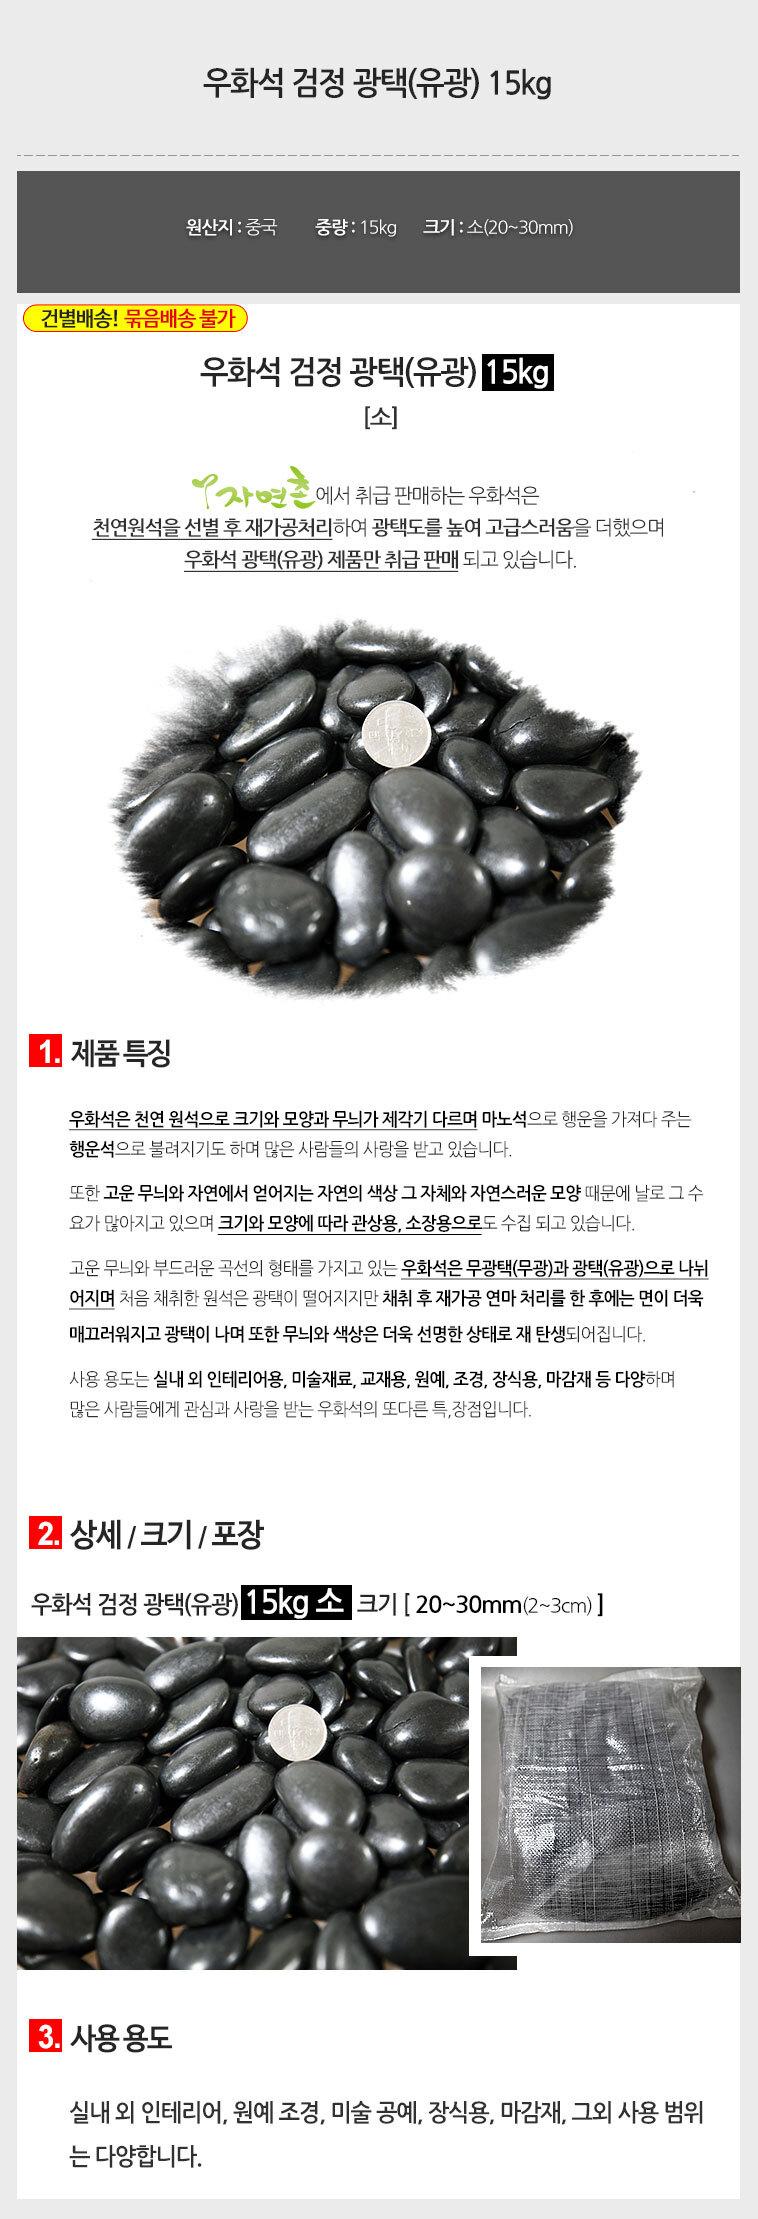 uhwaseok_black_15kg.jpg